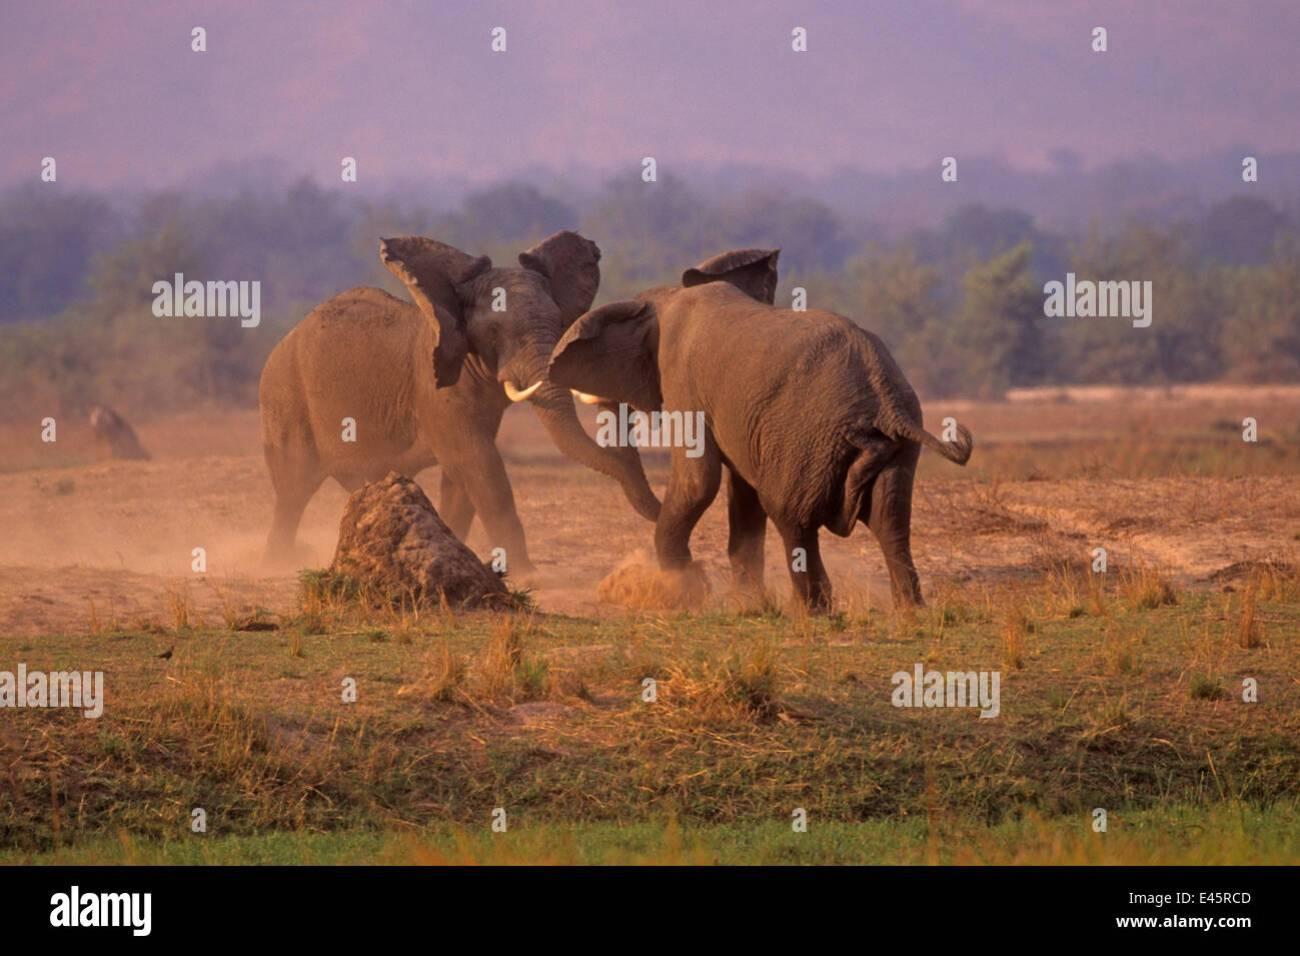 african elephant (loxodonta africana) bulls in dominance fight